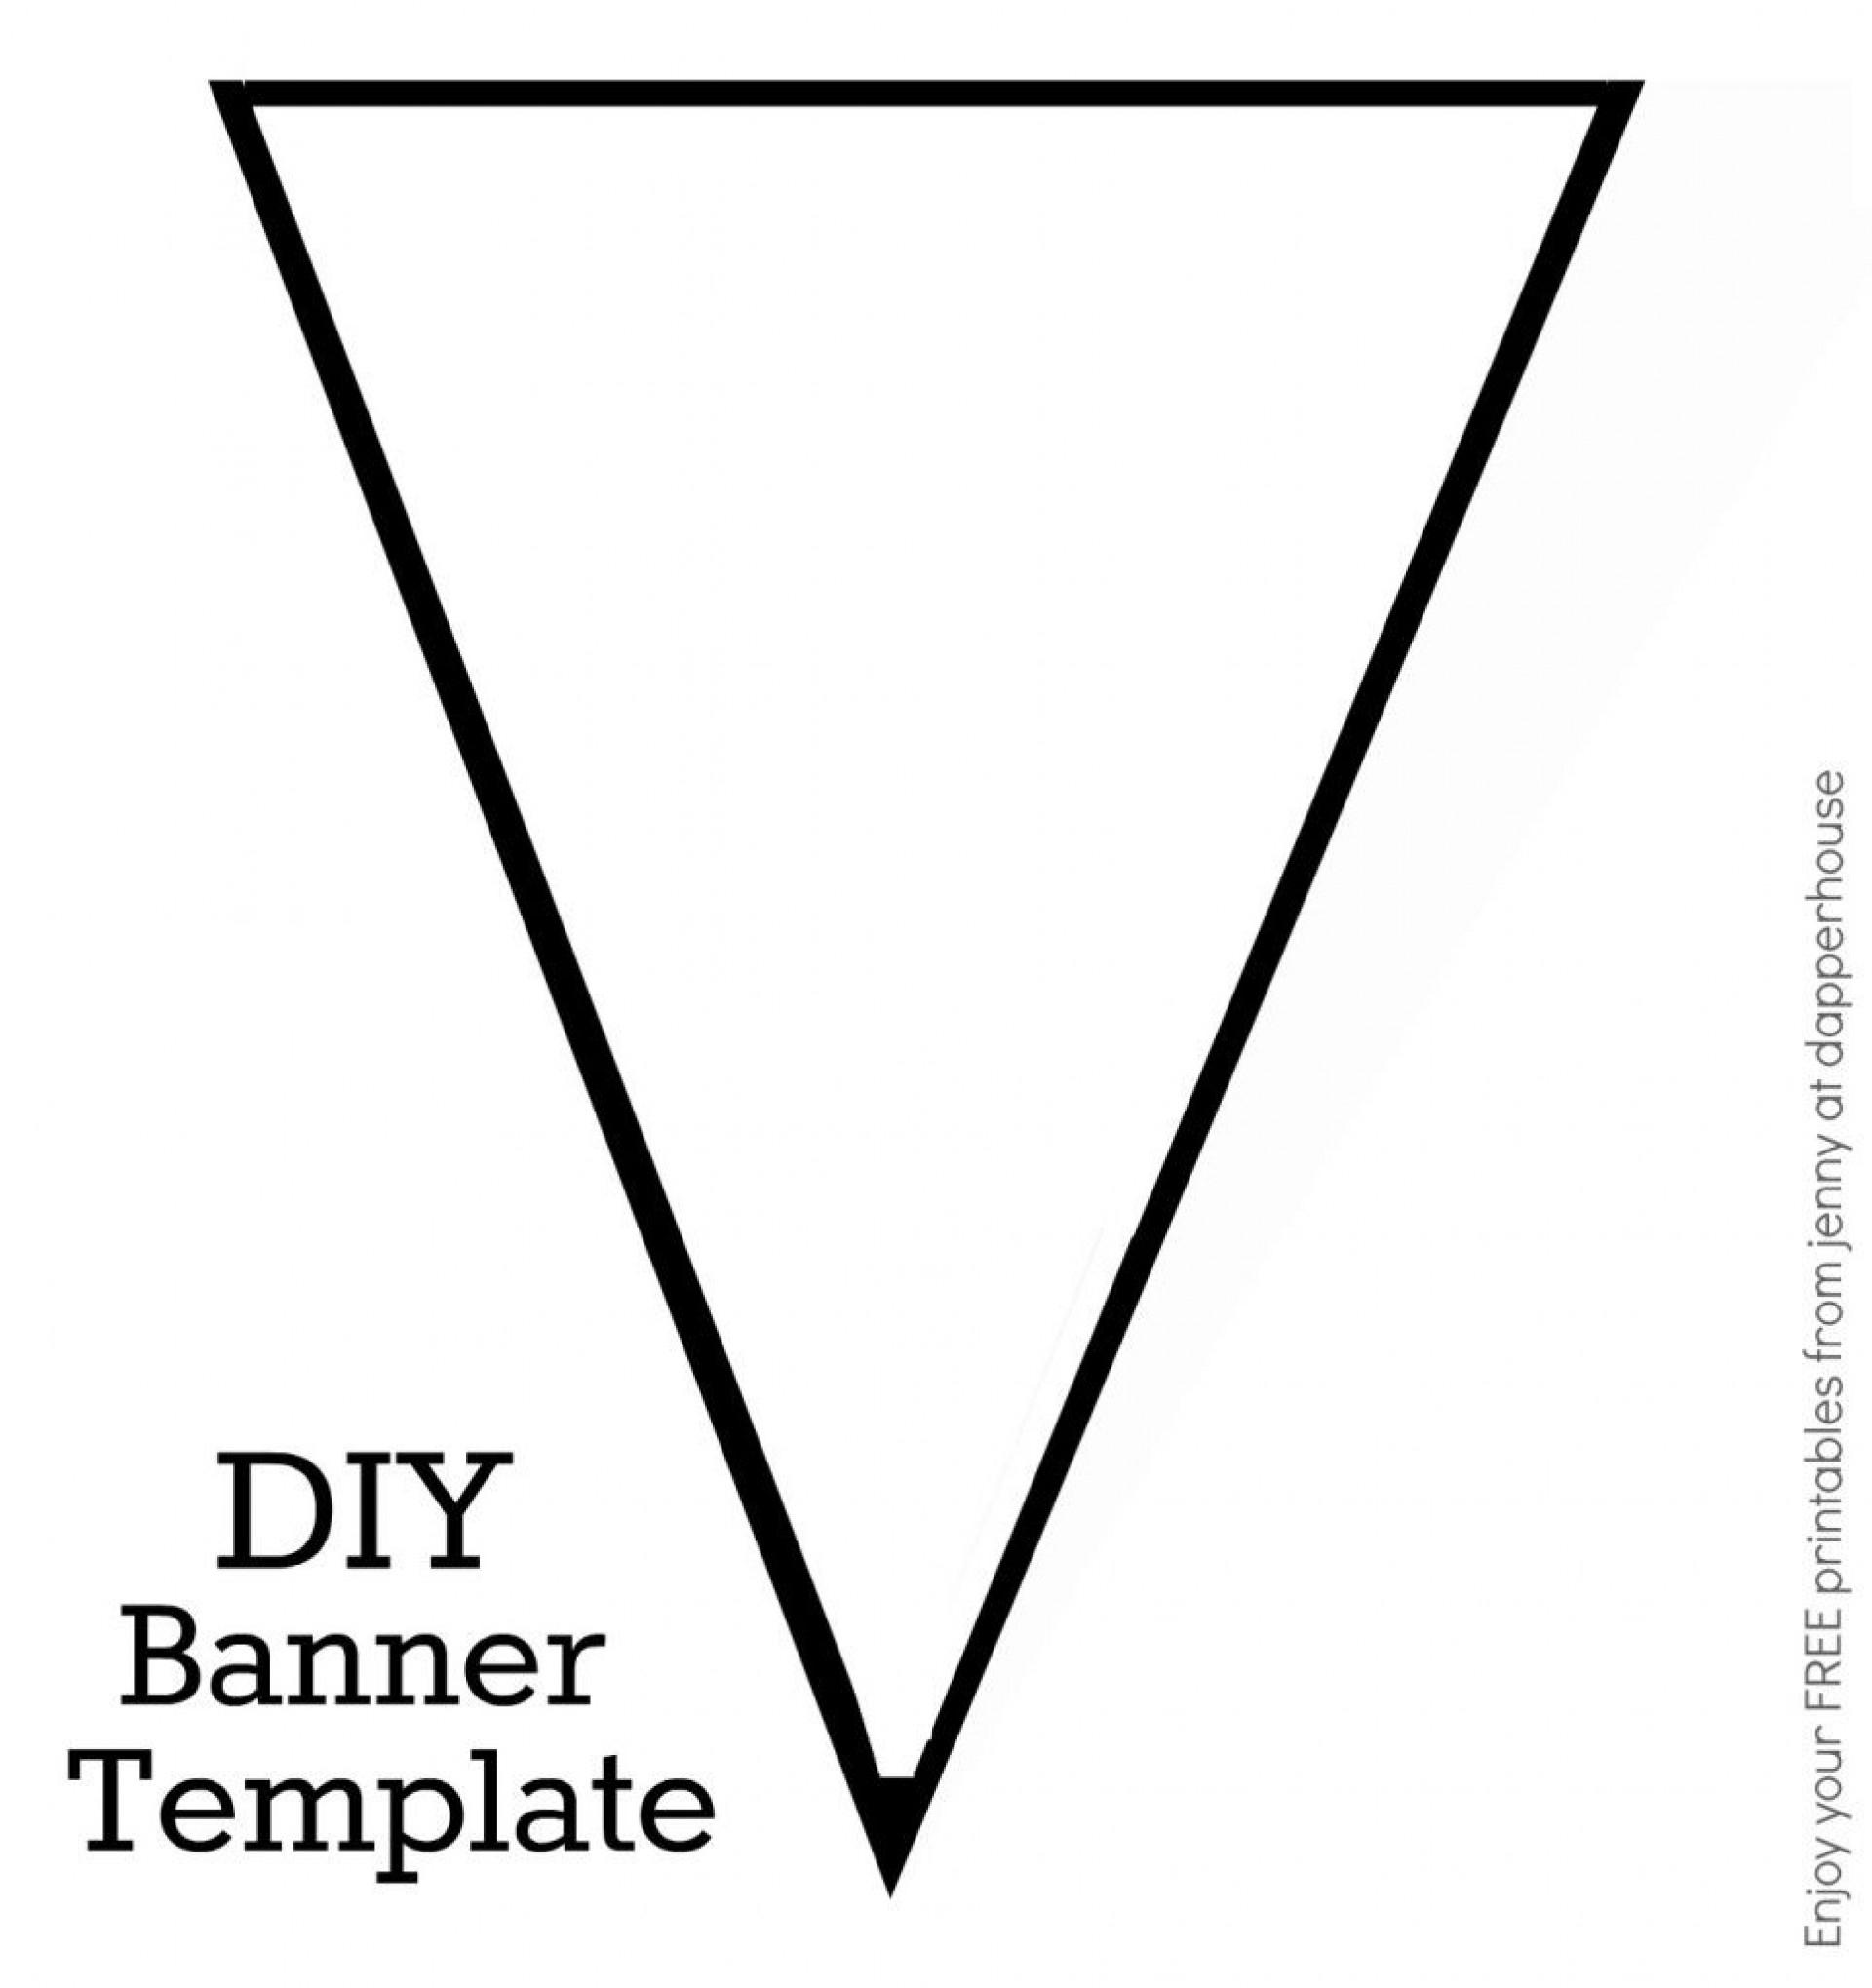 010 Free Printable Banner Template ~ Ulyssesroom - Free Printable Banner Templates For Word